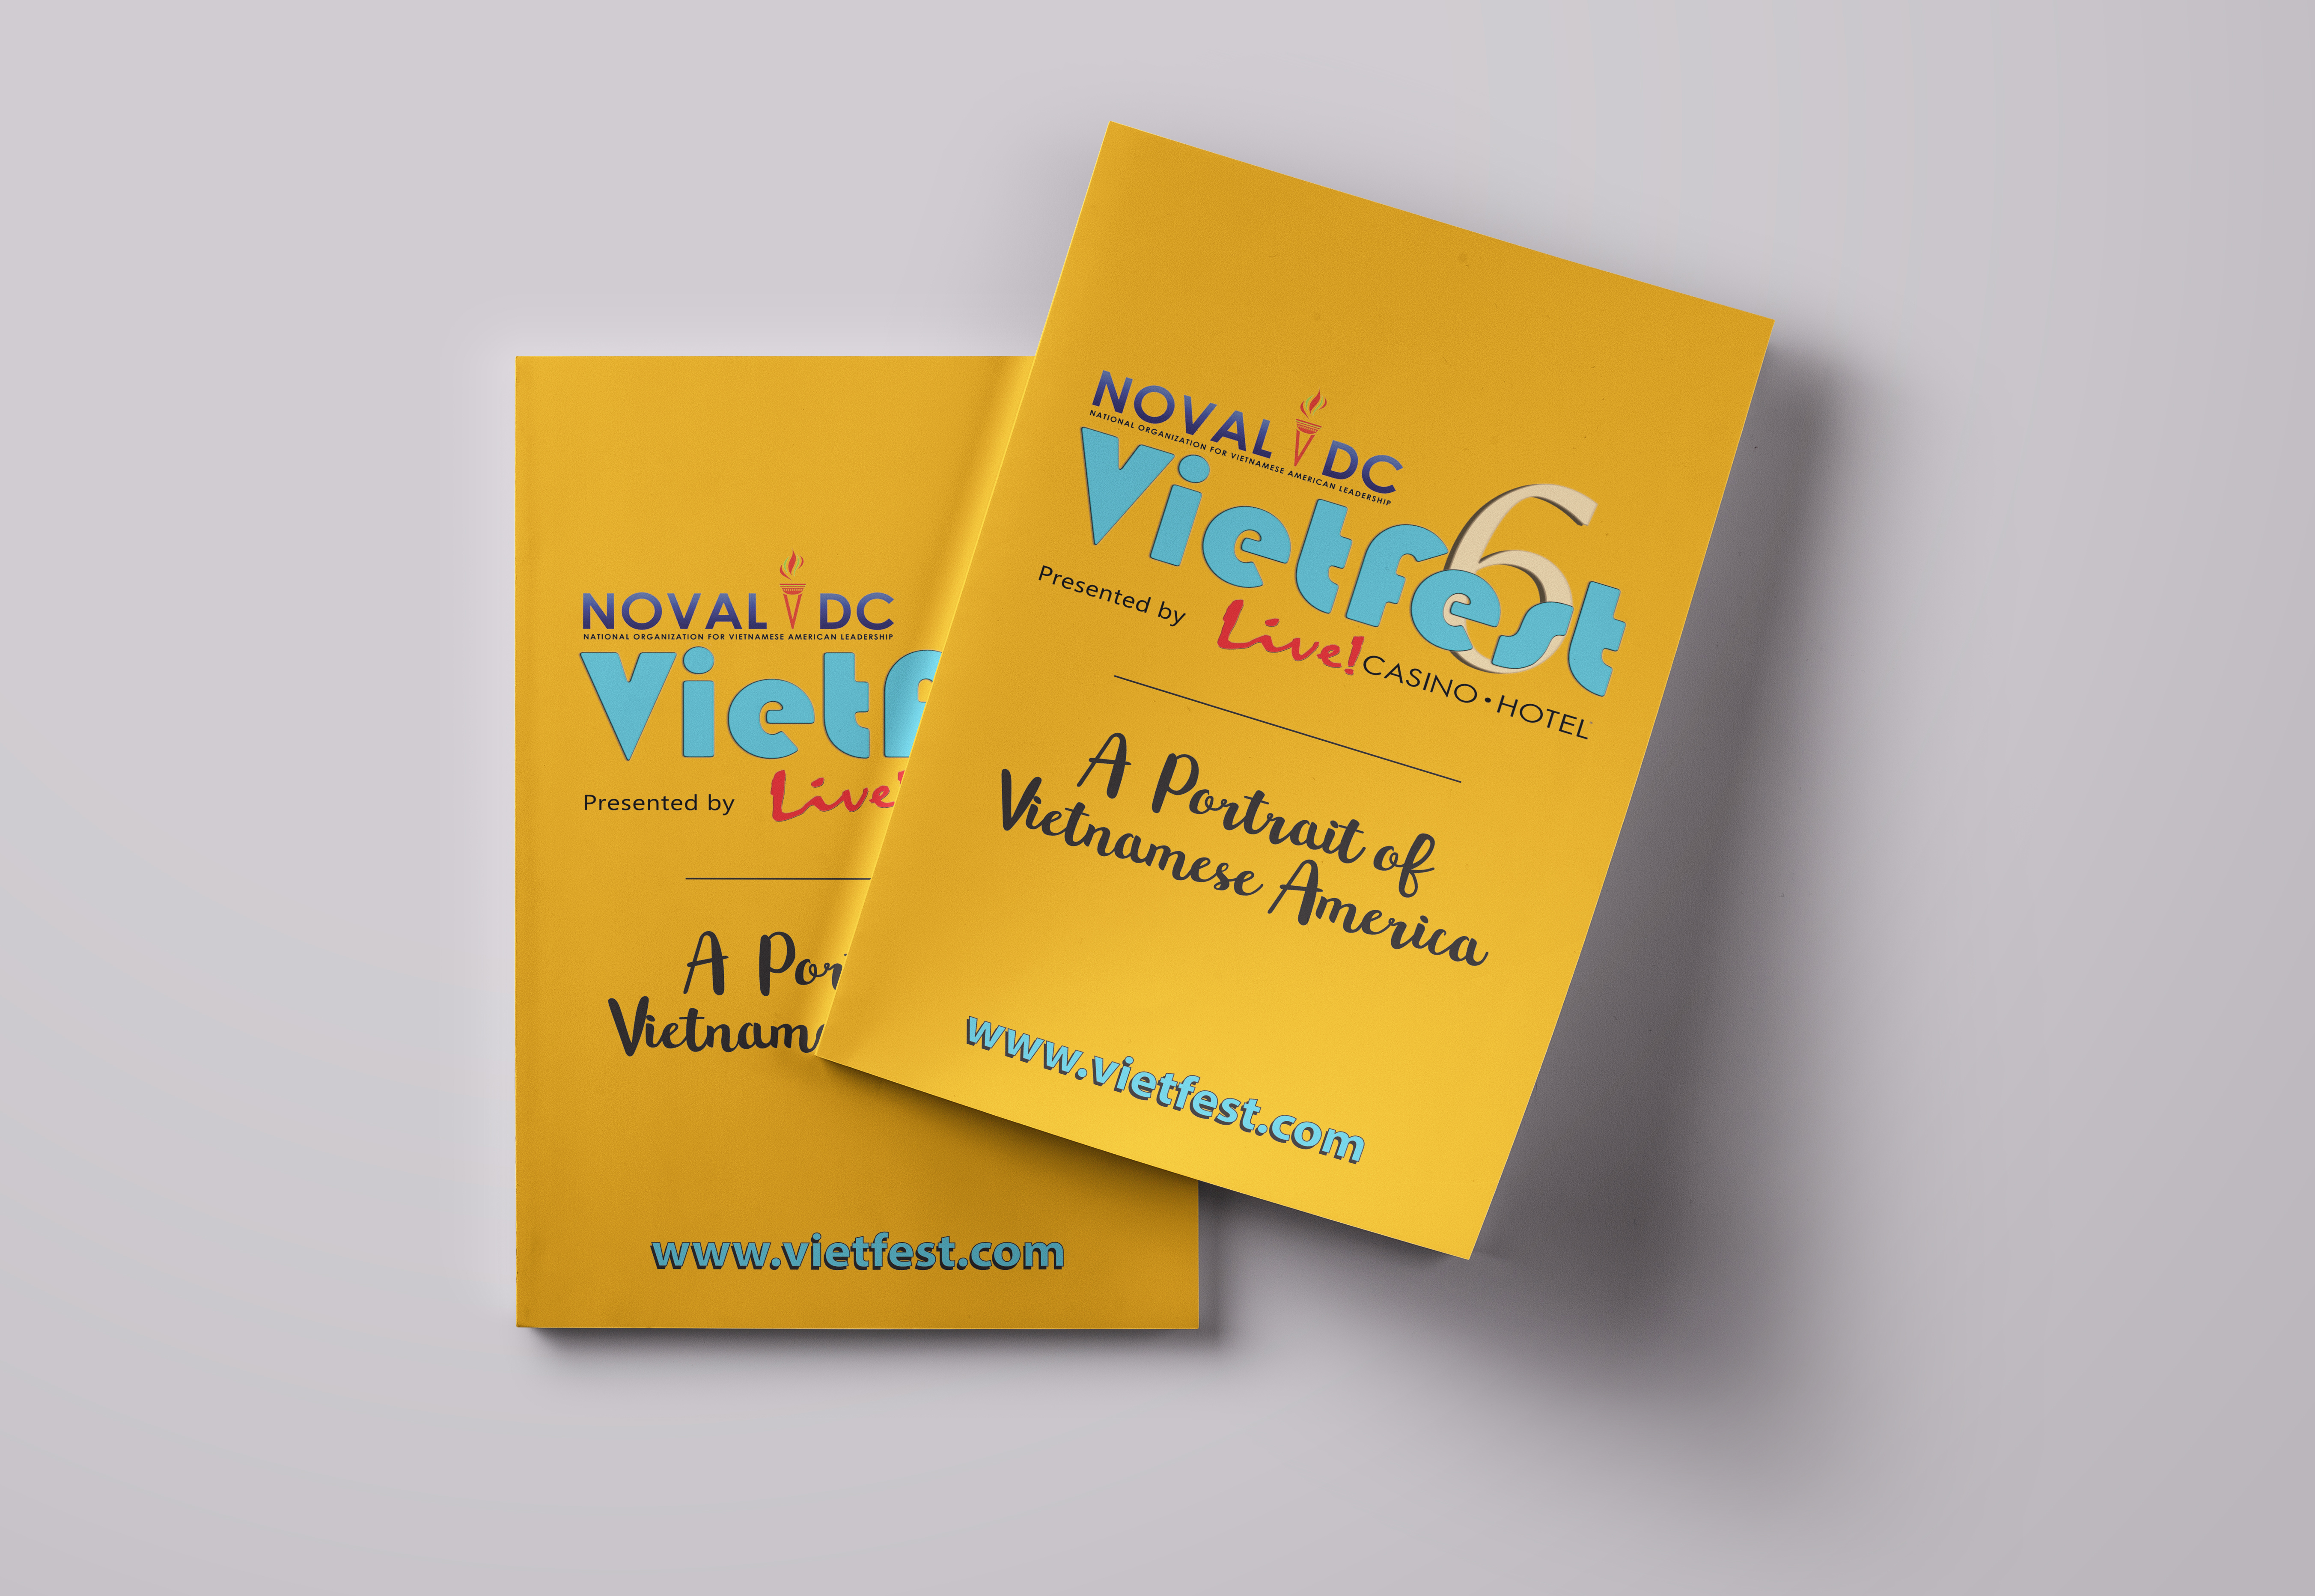 VietFest6 Booklet